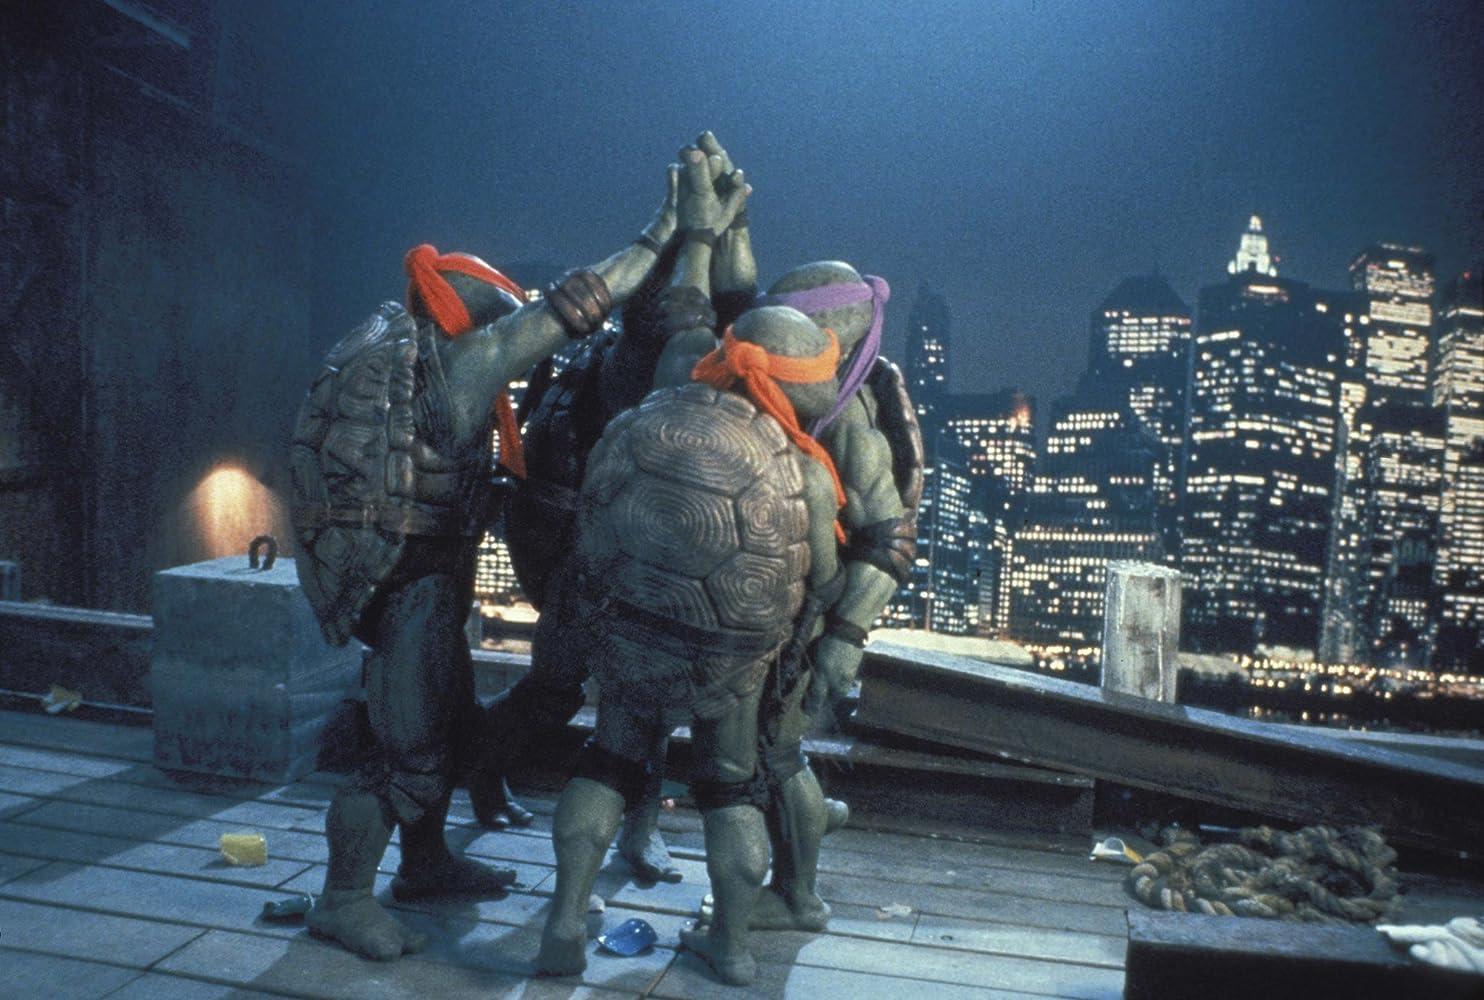 Retro review teenage mutant ninja turtles ii secret of the ooze - Retro Review Teenage Mutant Ninja Turtles Ii Secret Of The Ooze 52